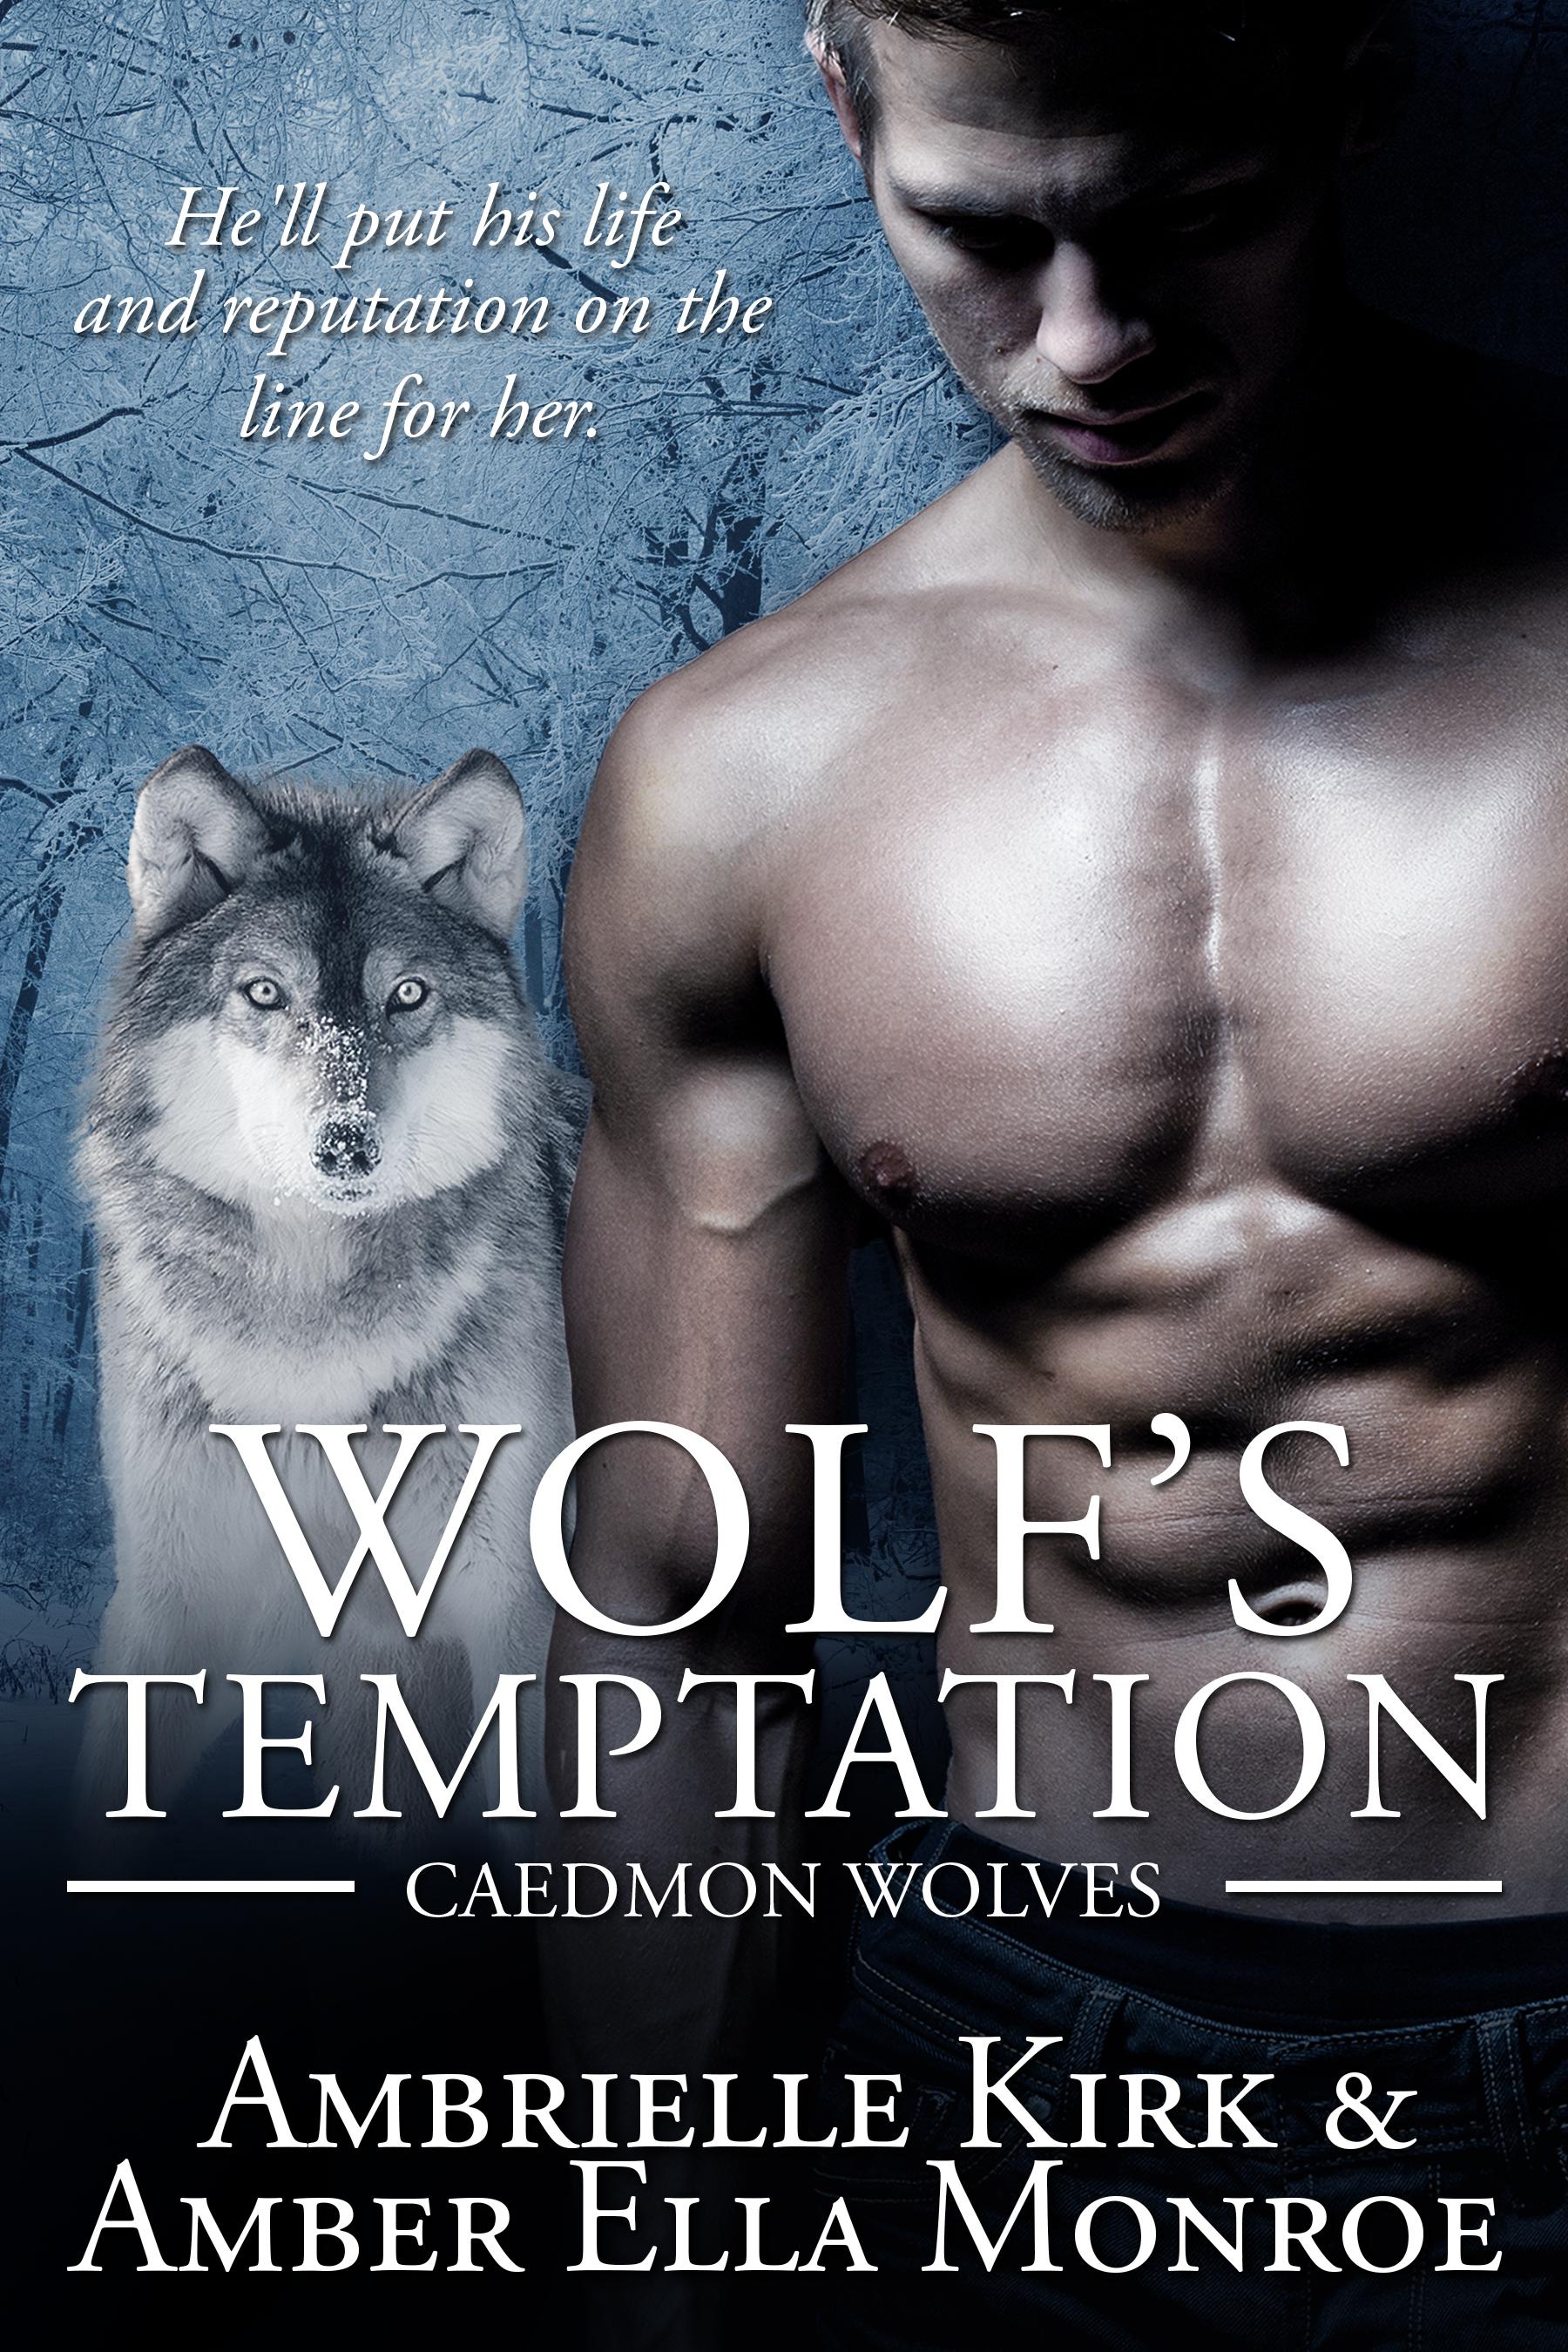 Wolfs Temptation (Caedmon Wolves #7) Ambrielle Kirk